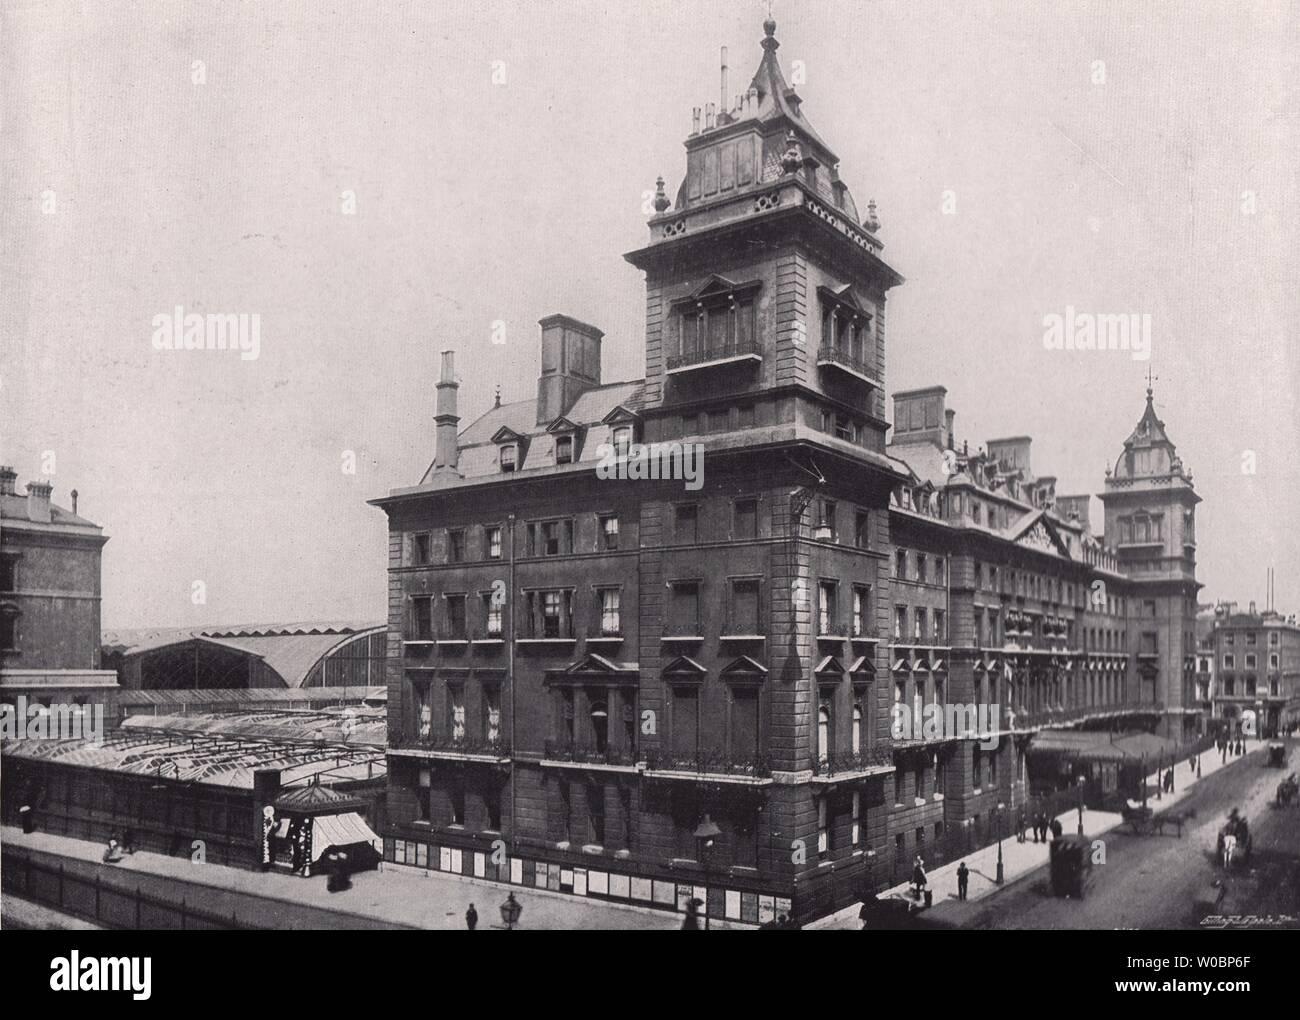 1896 Print over 120 years old Knightsbridge Barracks London x